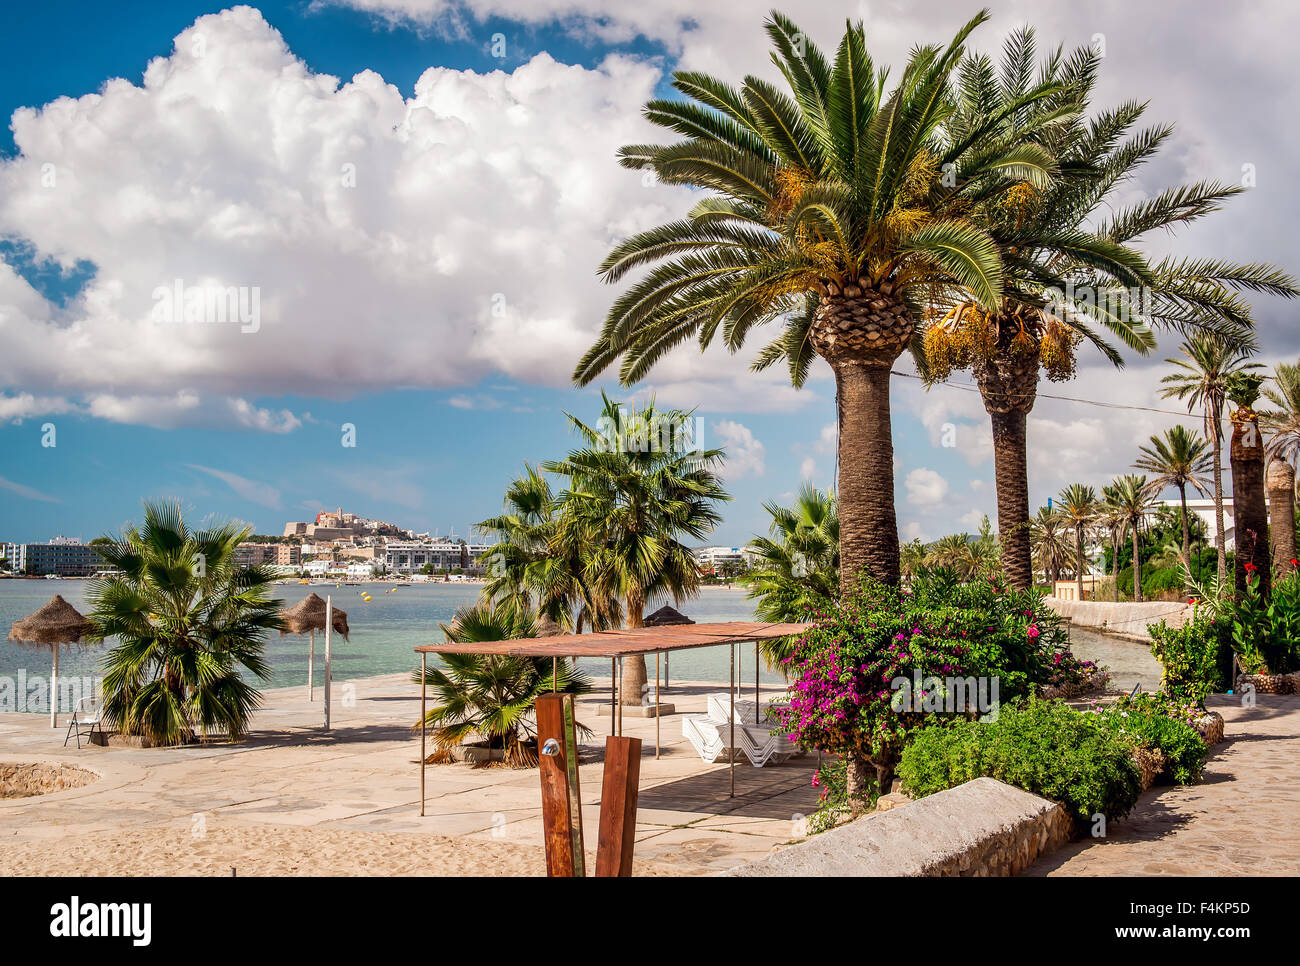 Seafront promenade of Ibiza. Balearic Islands. Spain - Stock Image